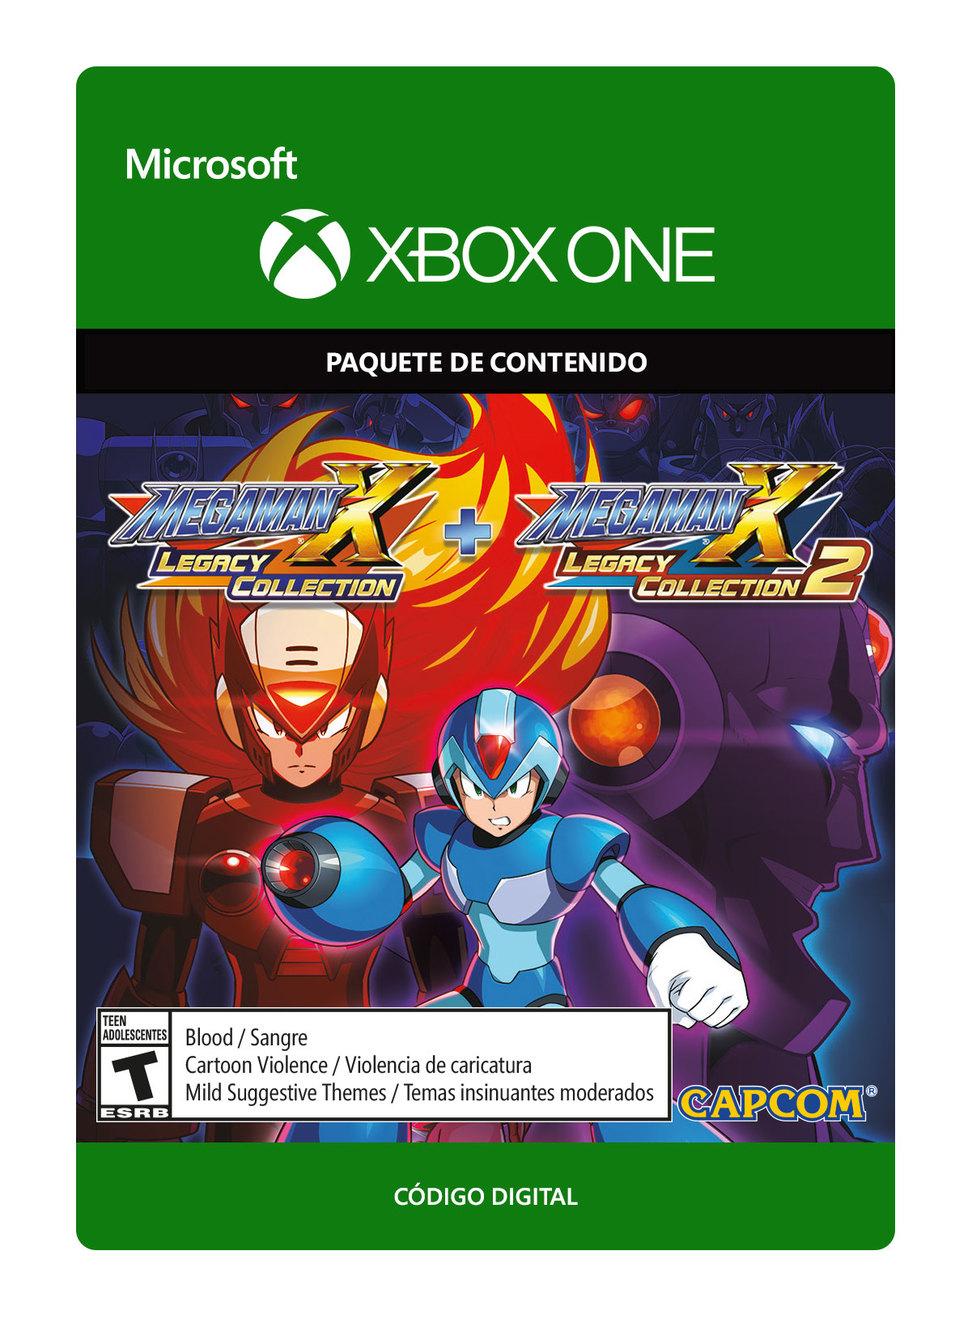 Mega Man X Legacy Collection 1 y 2 Bundle